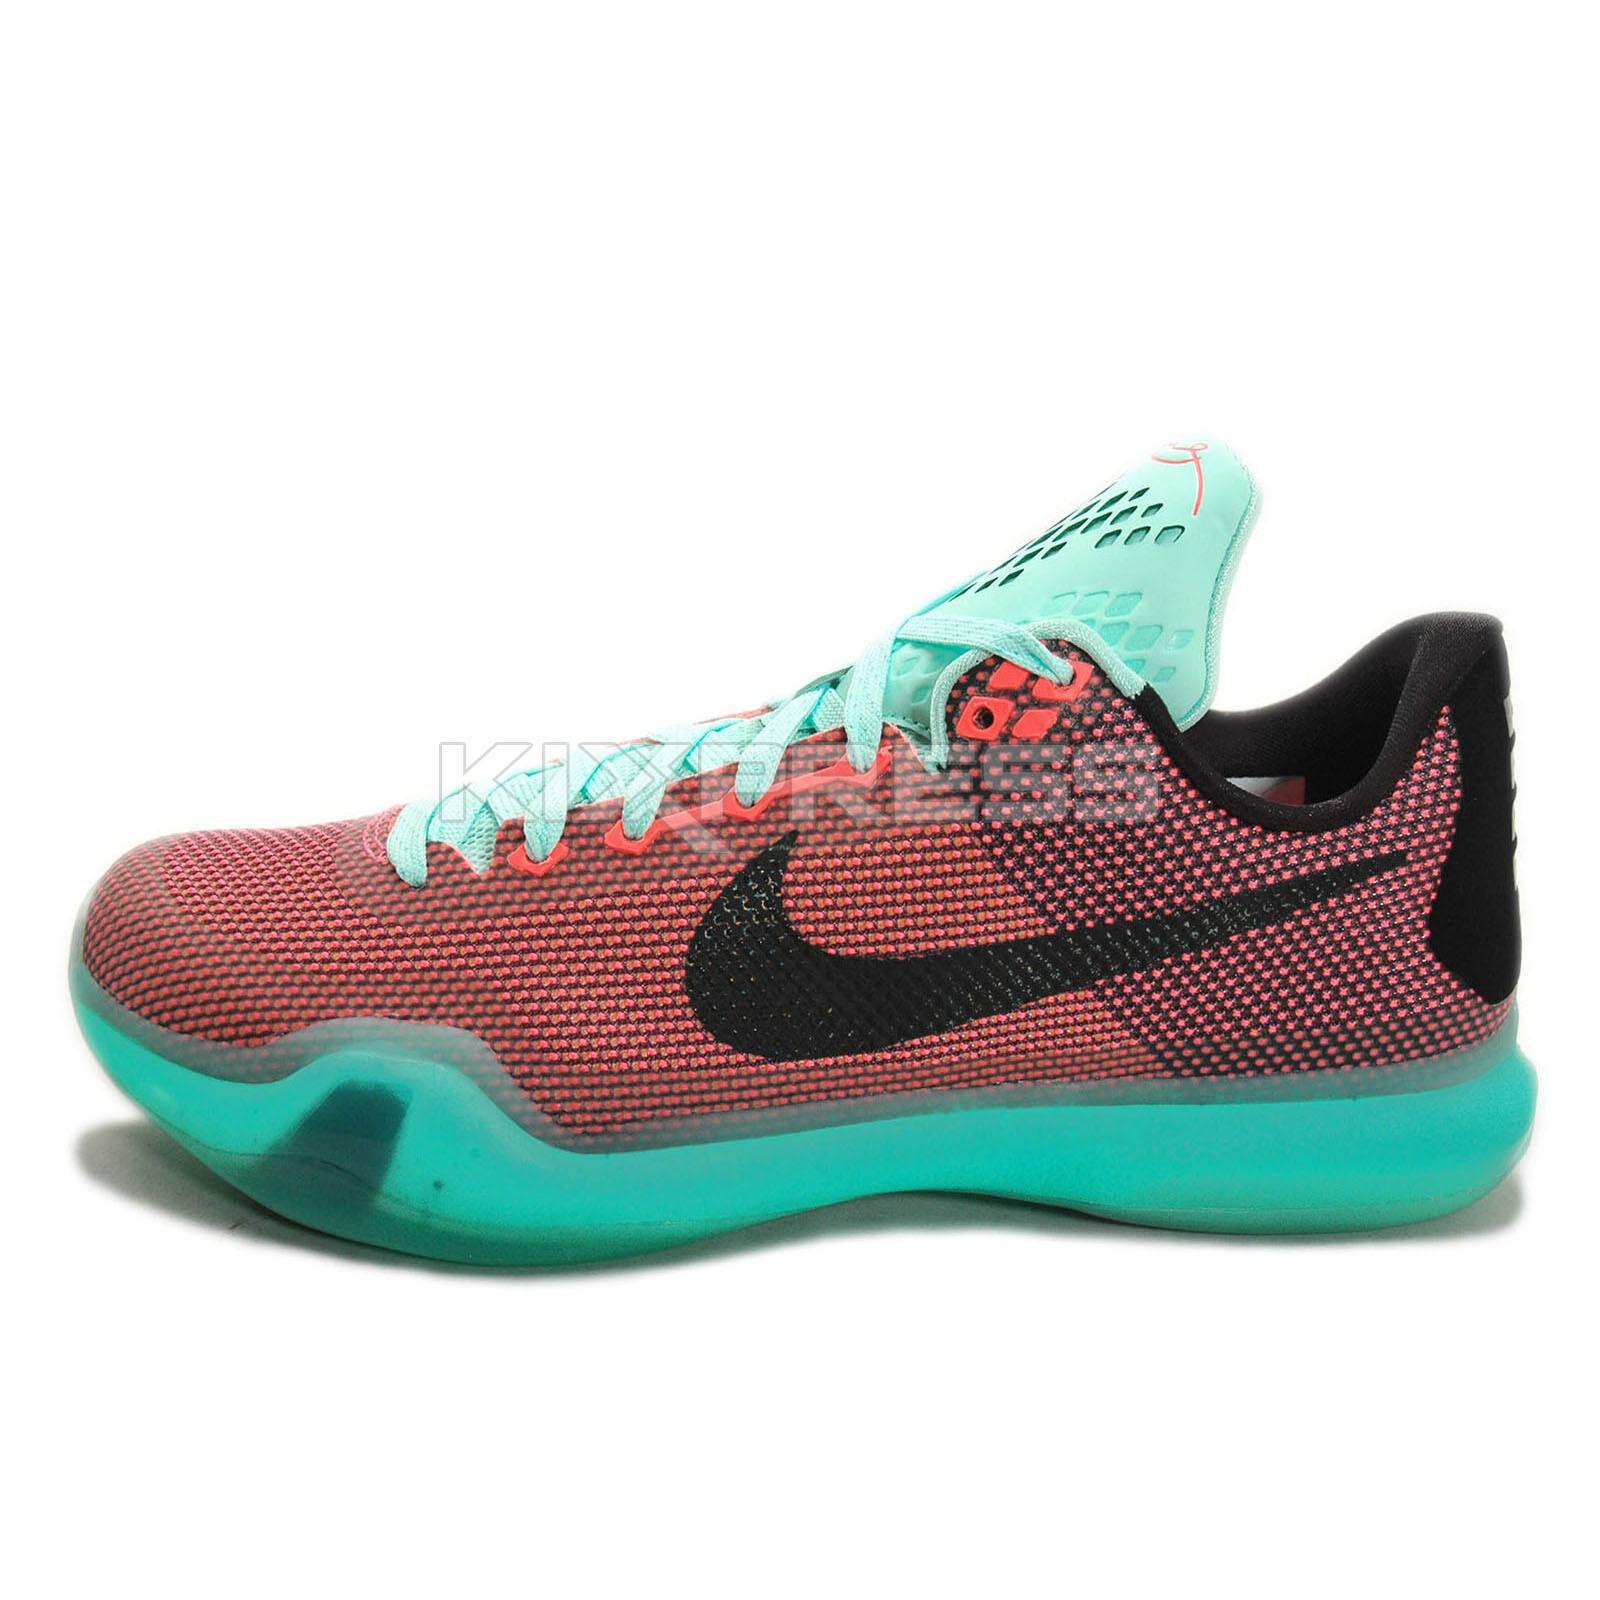 Nike Kobe X EP [745334-808] Basketball Easter Hot Lava/Artesian Teal HOT LAVA/BLK-SNST GLW-ARTSN TL...